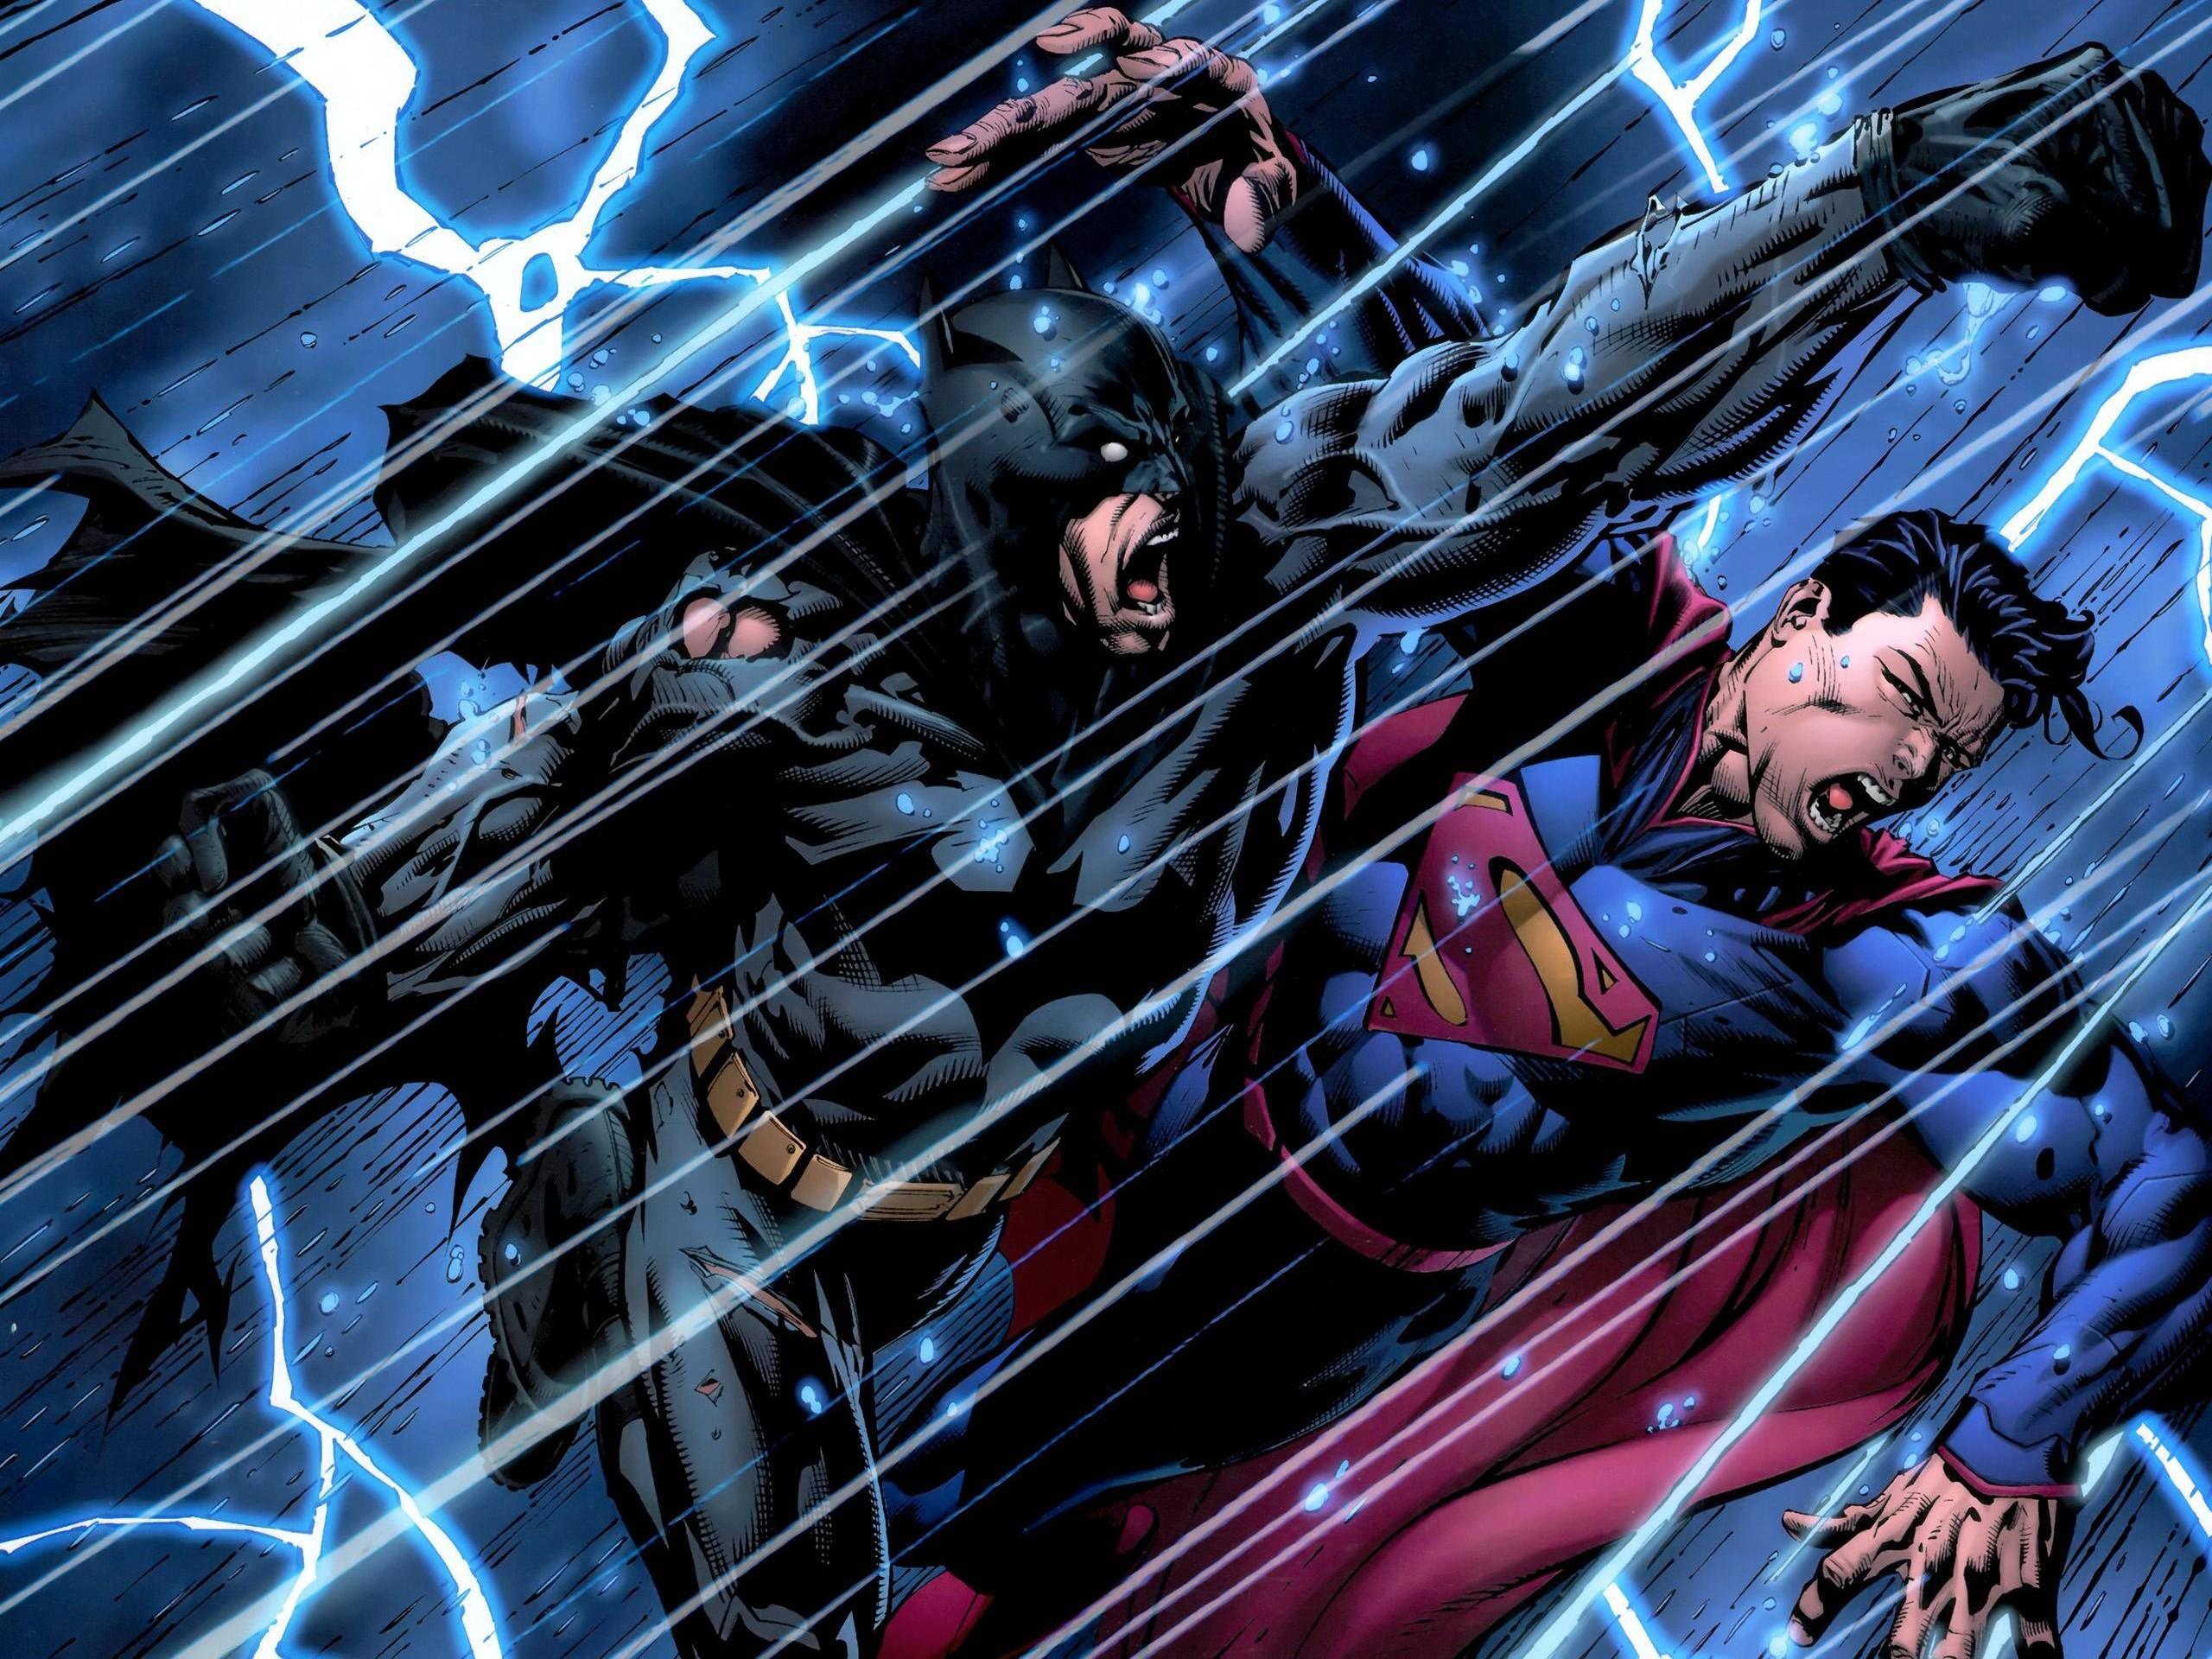 15 Batman: The Dark Knight HD Wallpapers | Backgrounds – Wallpaper Abyss